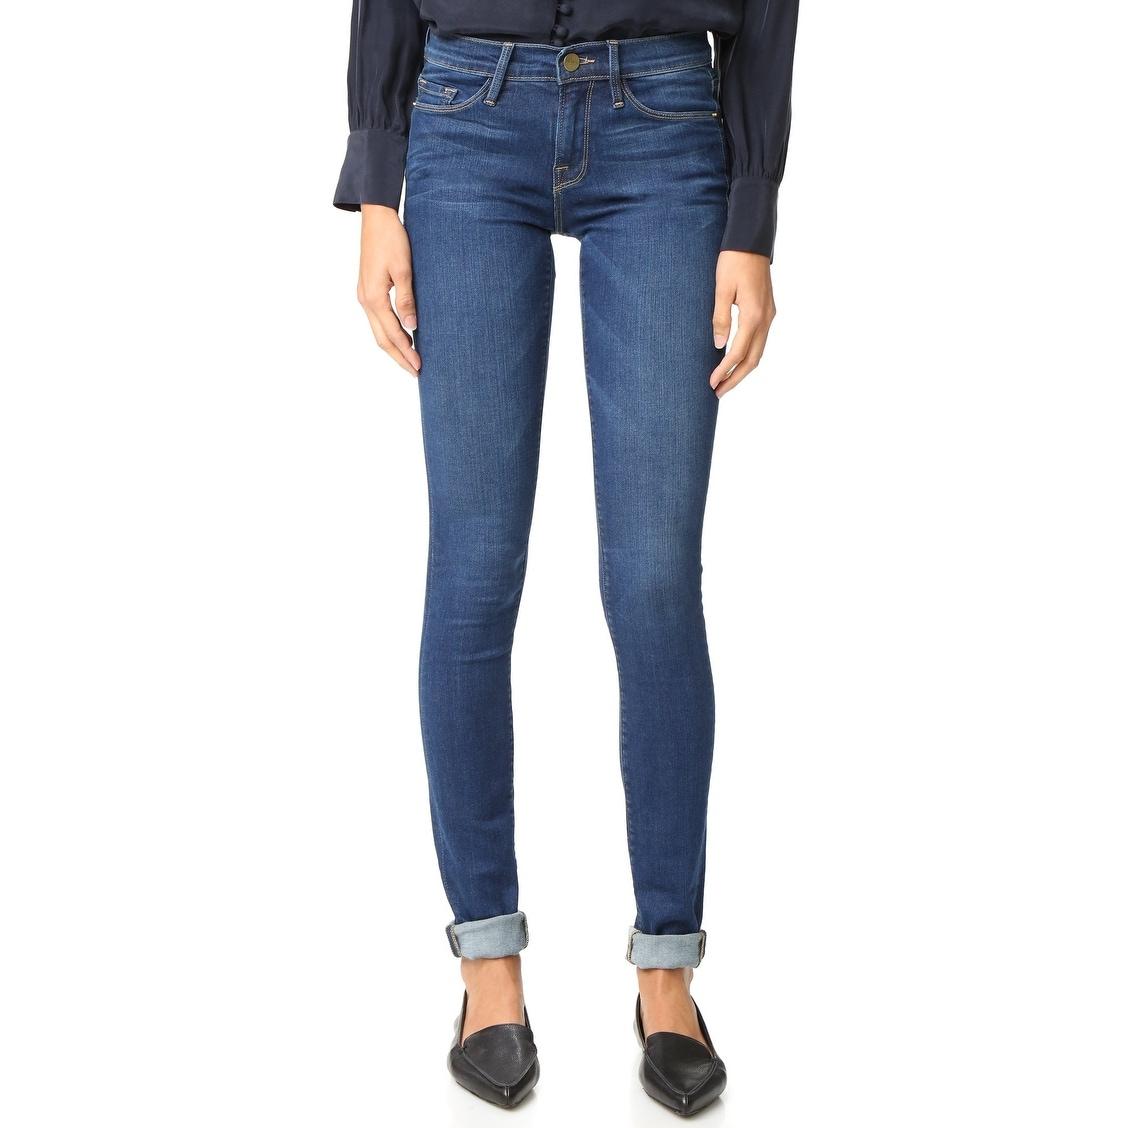 Shop Frame Denim NEW Womens Size 24x36 Forever Karlie Tall Skinny ...